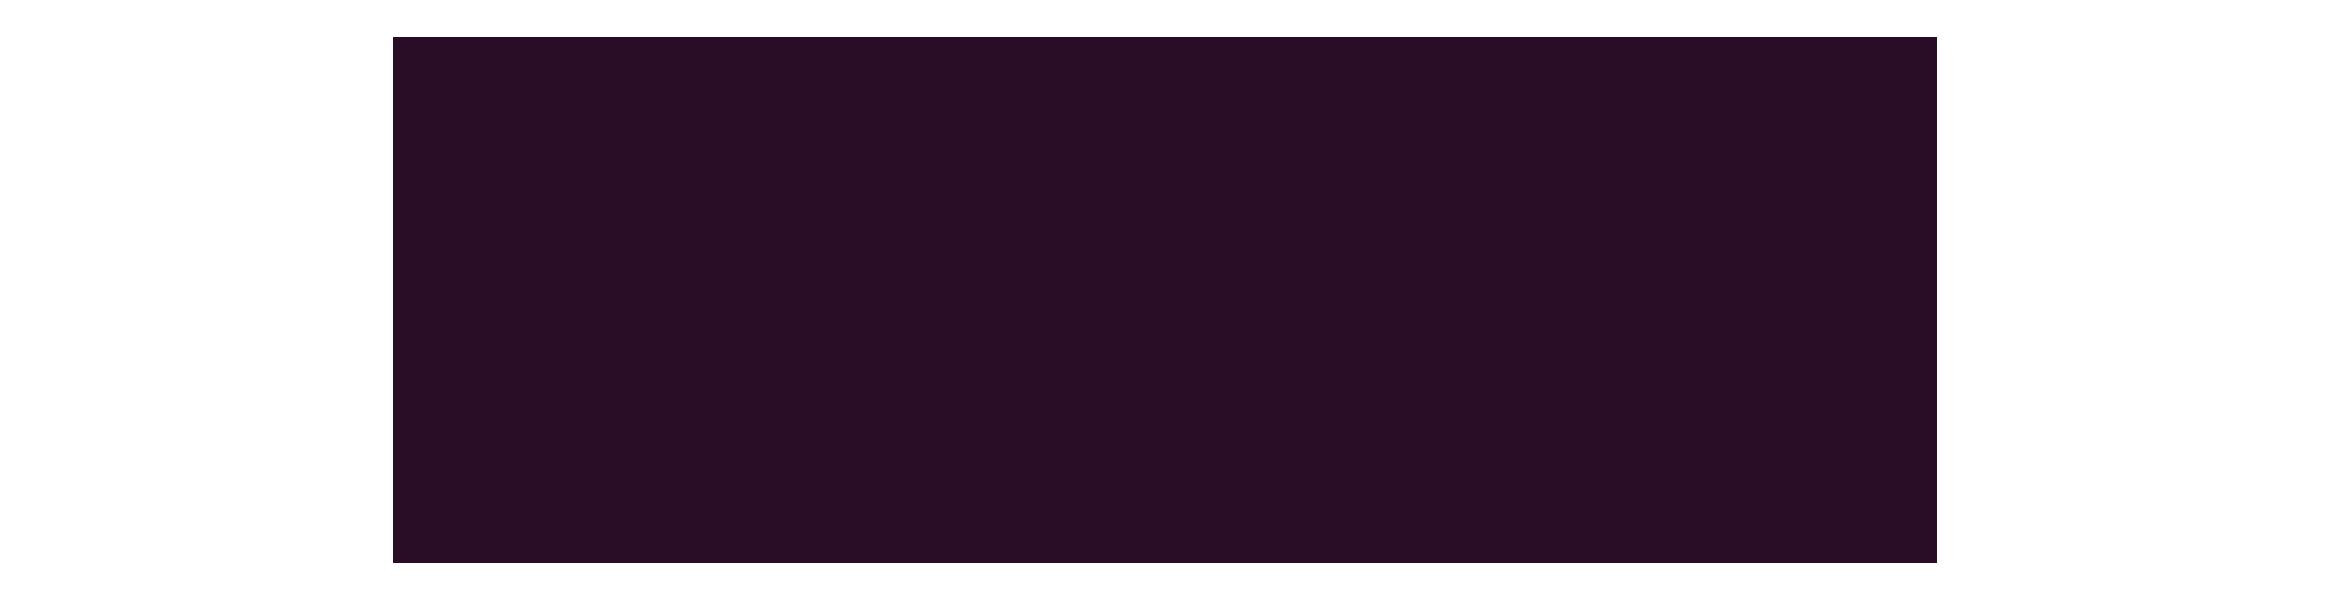 Joy Velasco